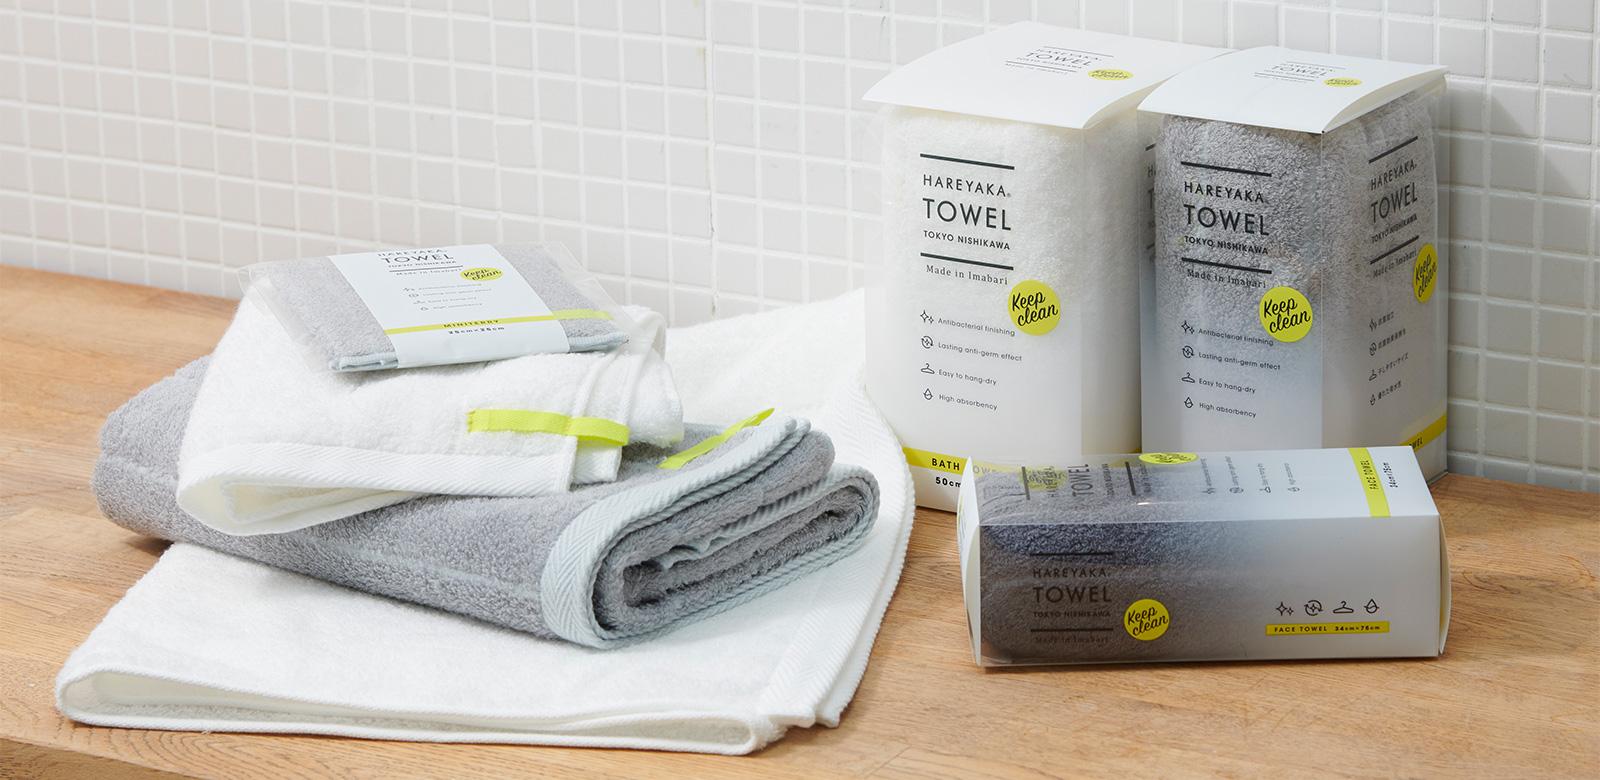 Nishikawa Nishikawa Imabari towel Silver Face towel made in Japan antibacteria